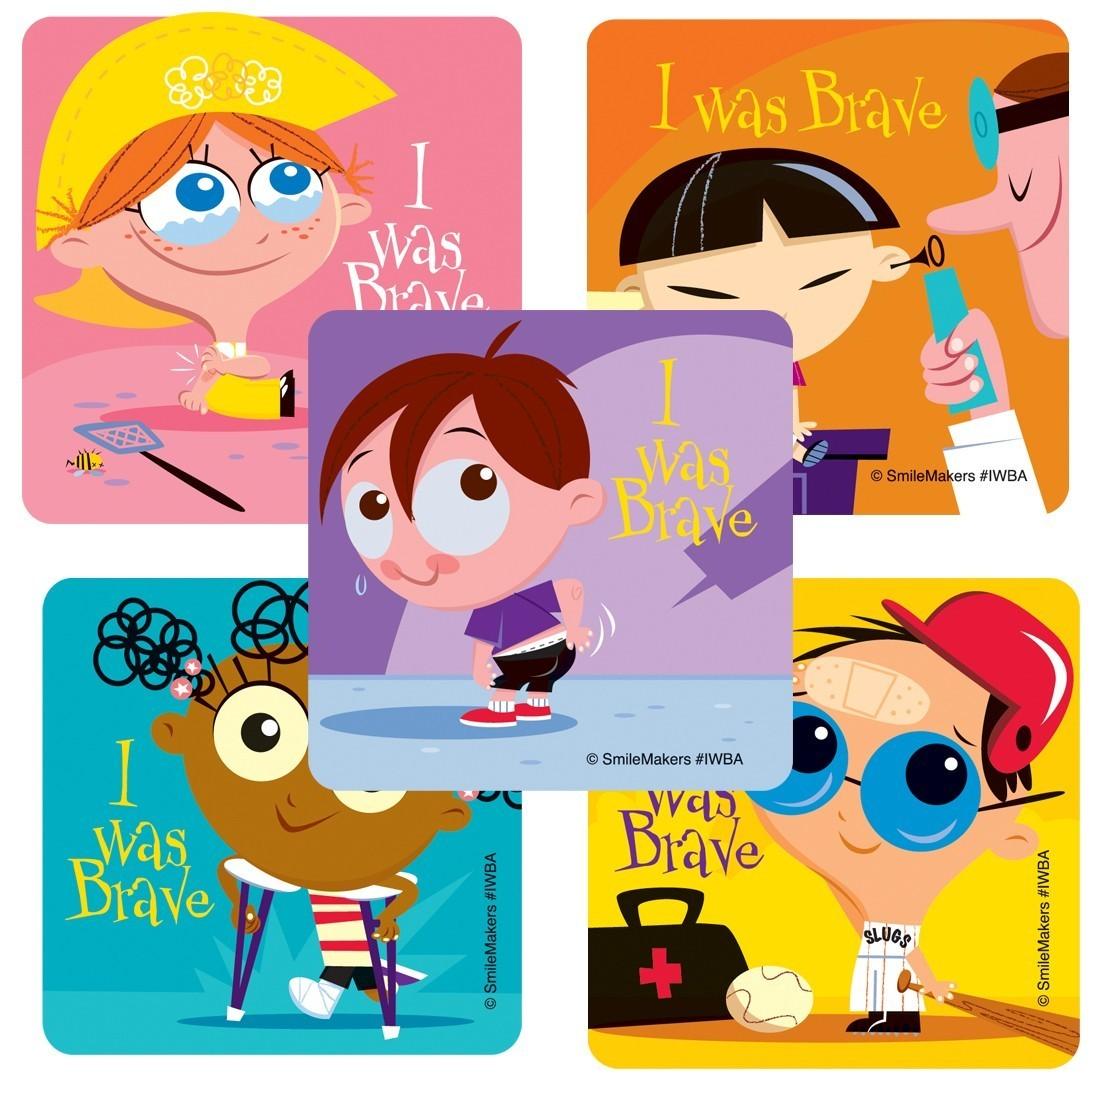 Brave Kids Stickers                                [image]